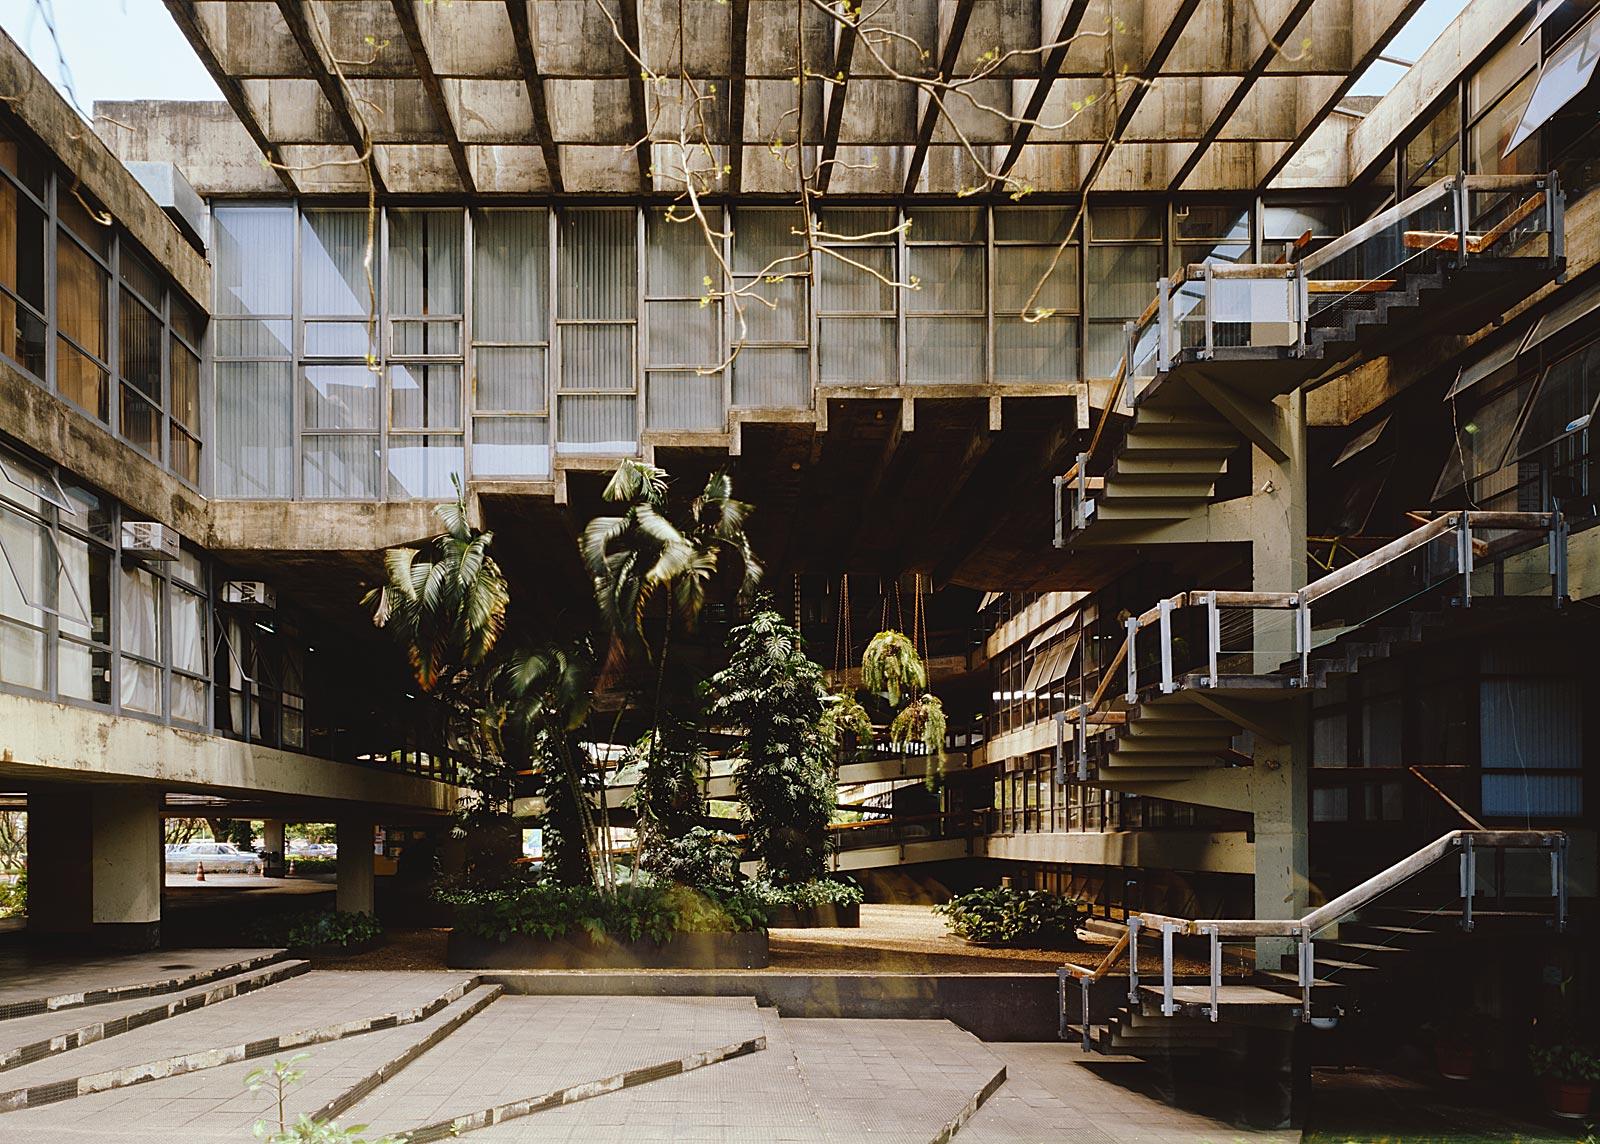 Reitoria, Universidade de Brasília, Brasilia